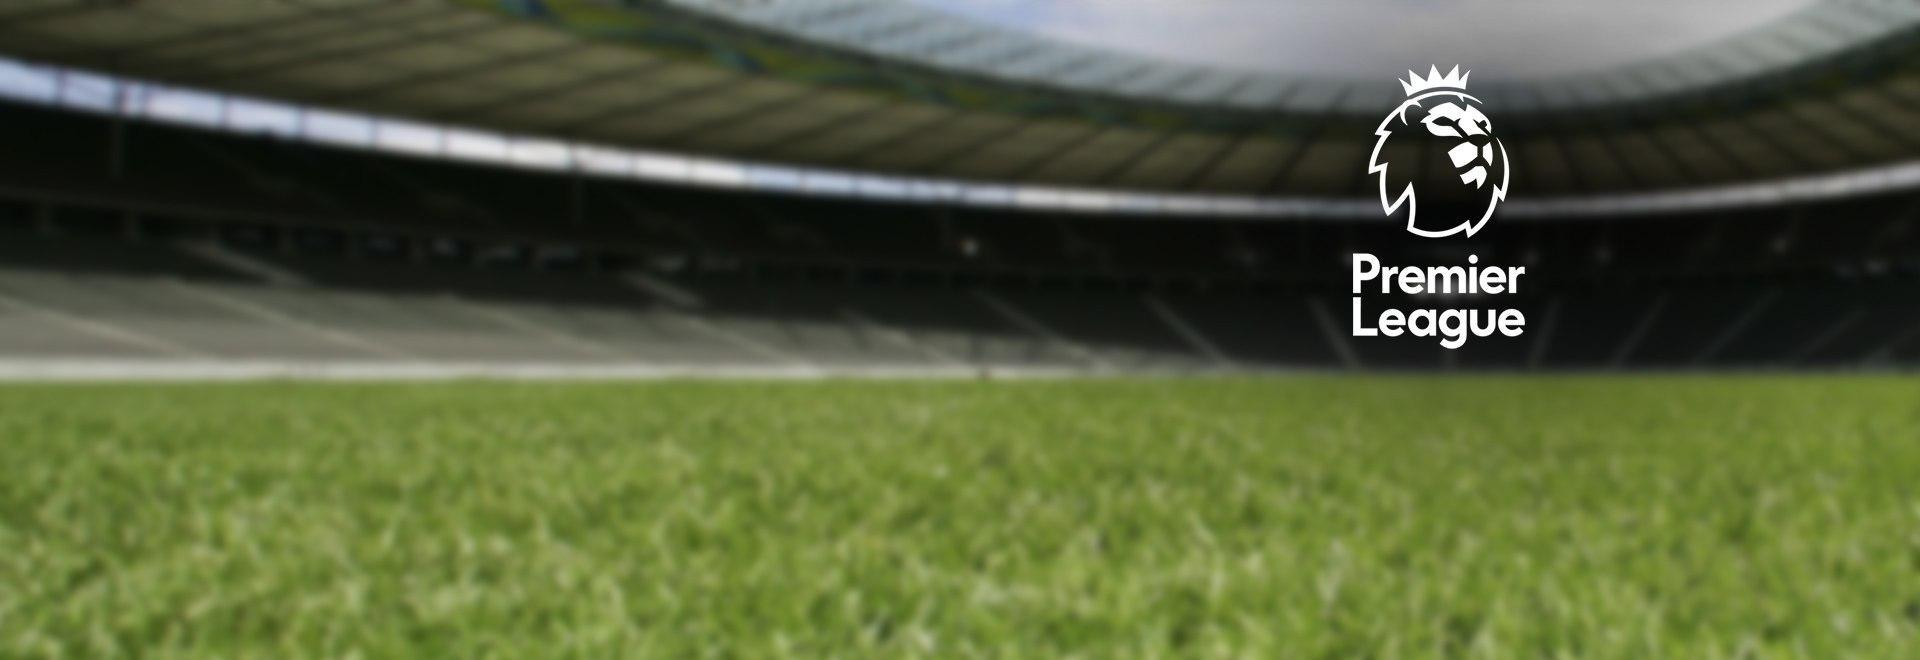 Aston Villa - Sheffield United. 2a g.